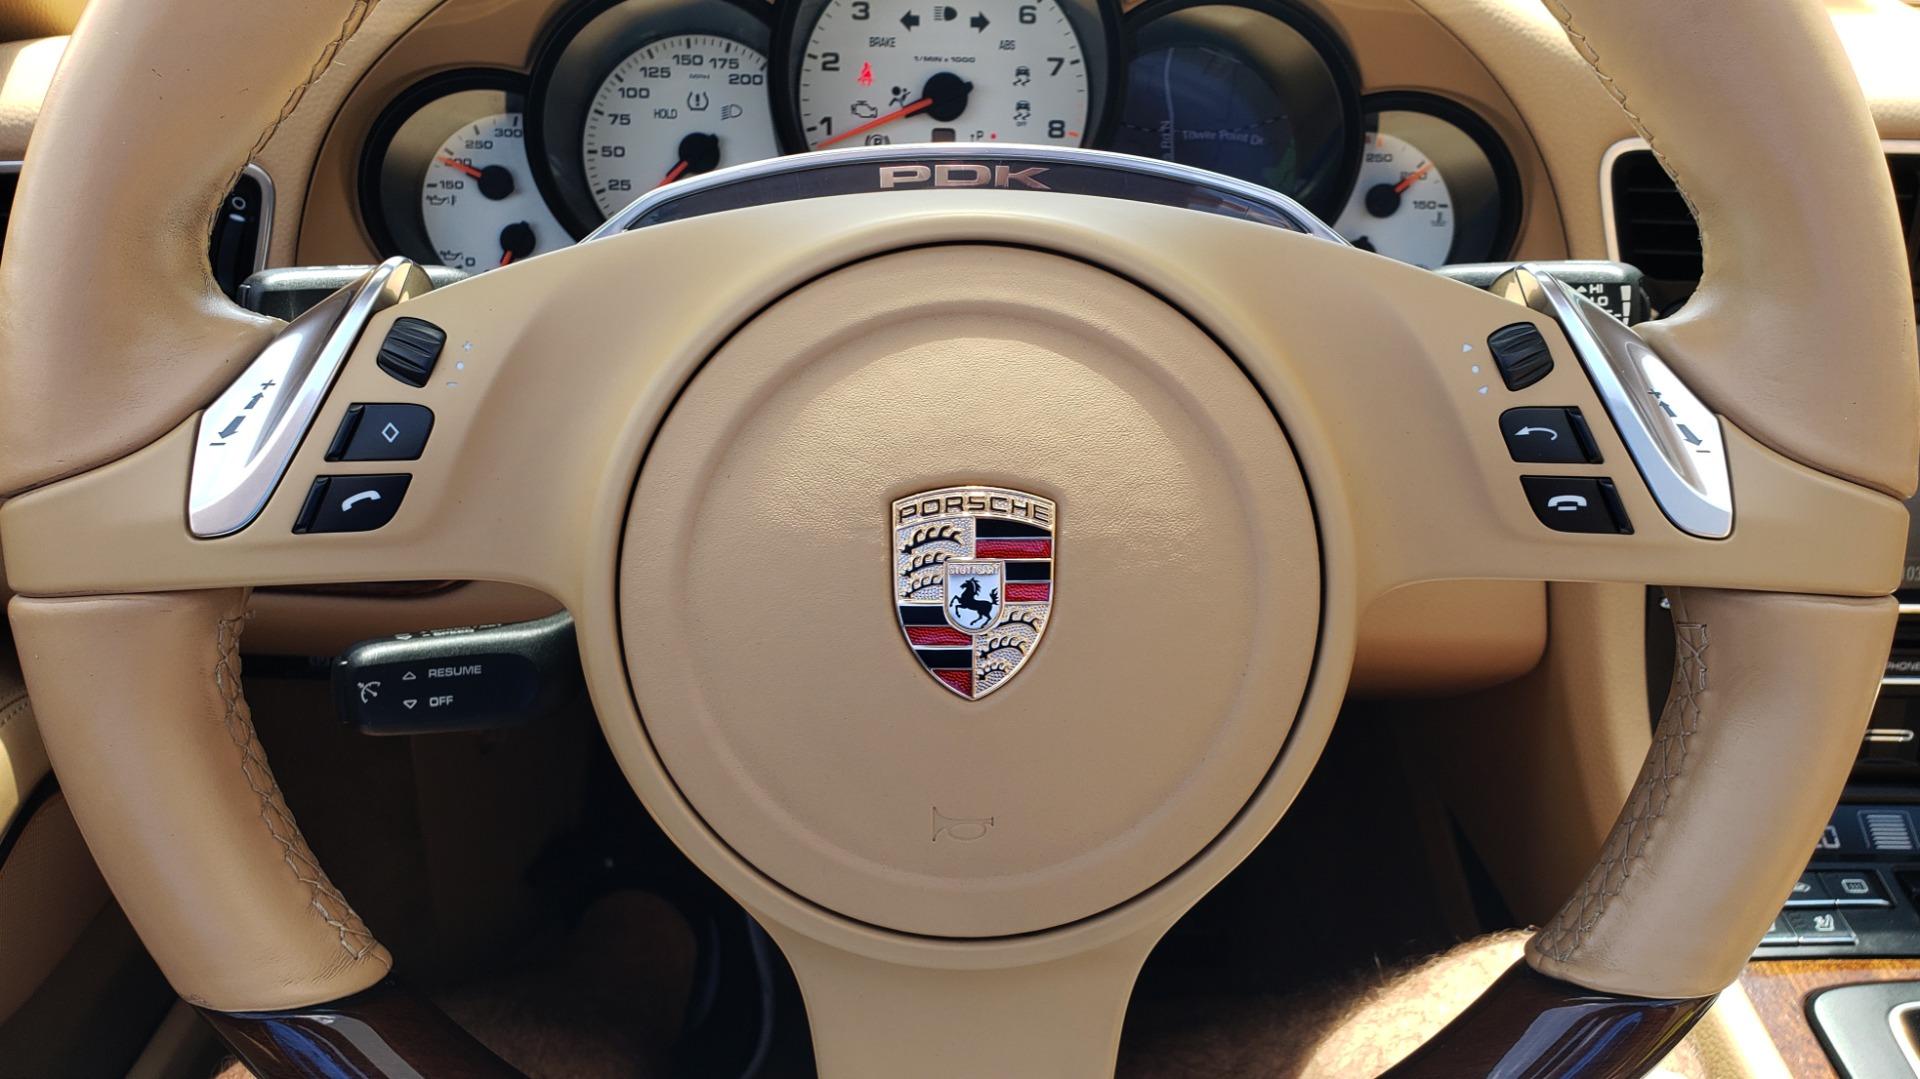 Used 2014 Porsche 911 CARRERA S CABRIOLET / PREM PKG / PDK / NAV / BOSE / SPORT CHRONO for sale $81,995 at Formula Imports in Charlotte NC 28227 26